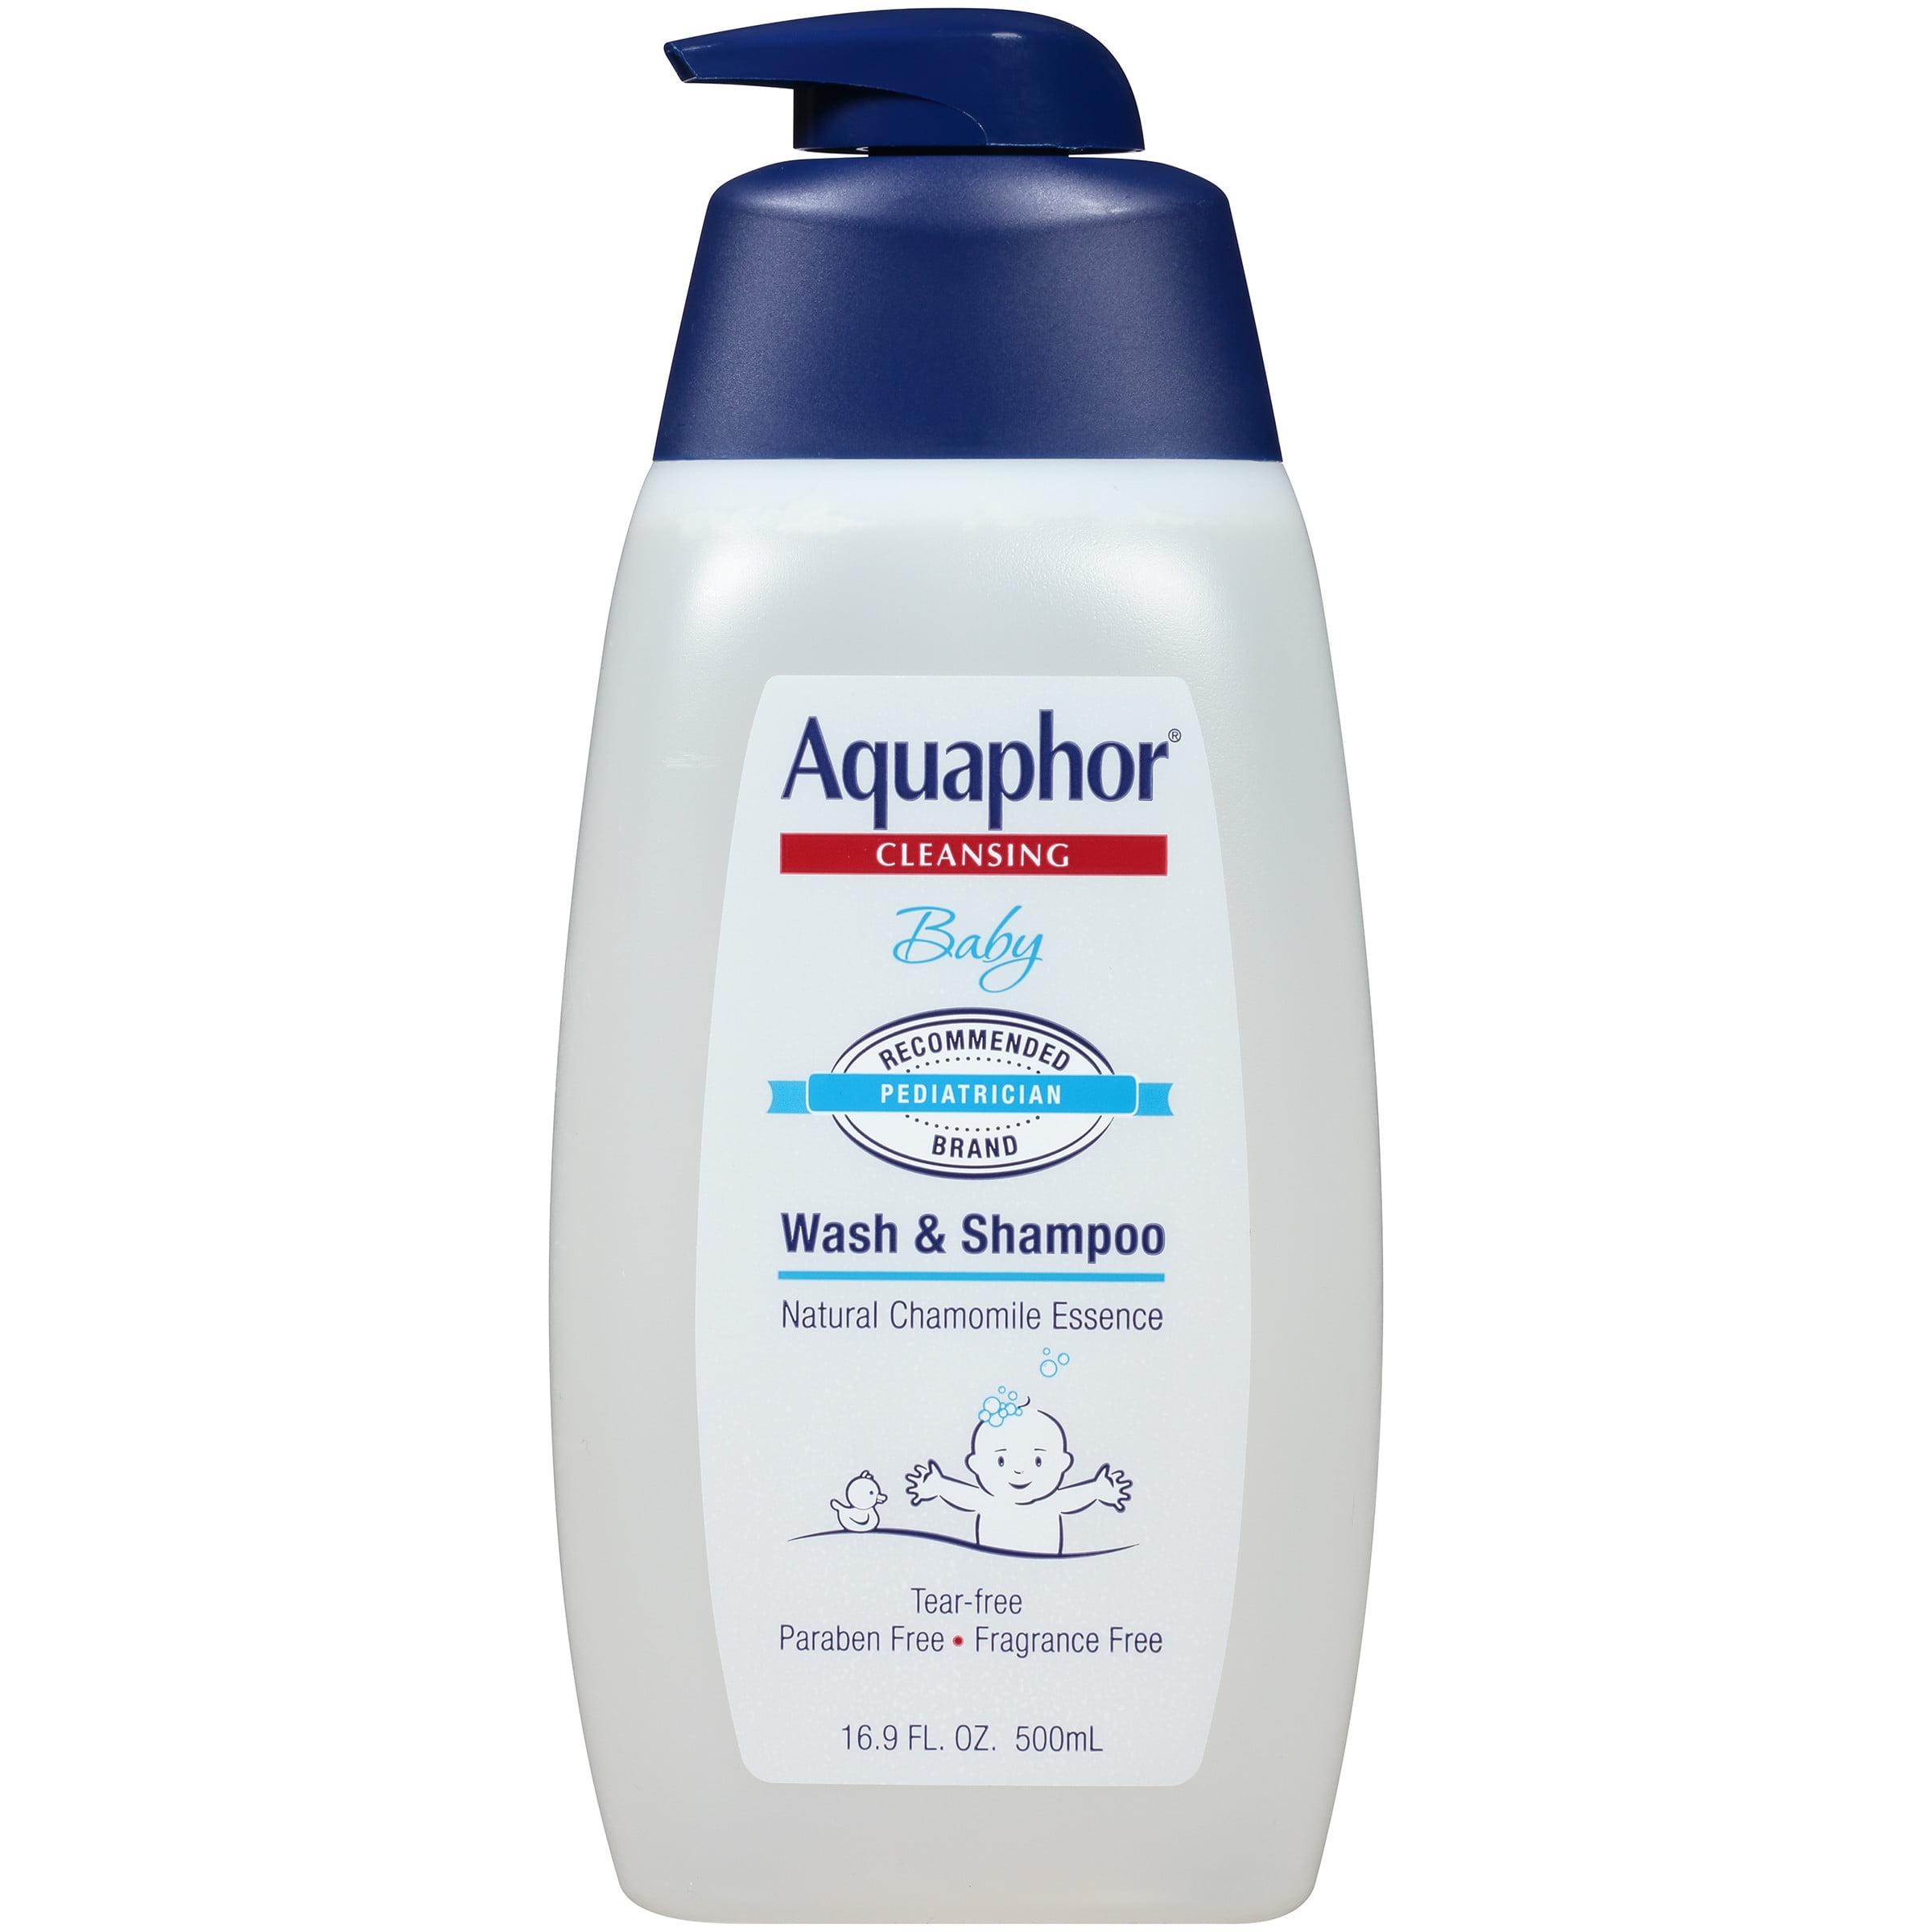 Aquaphor Baby Wash & Shampoo 16.9 fl. oz. by Beiersdorf